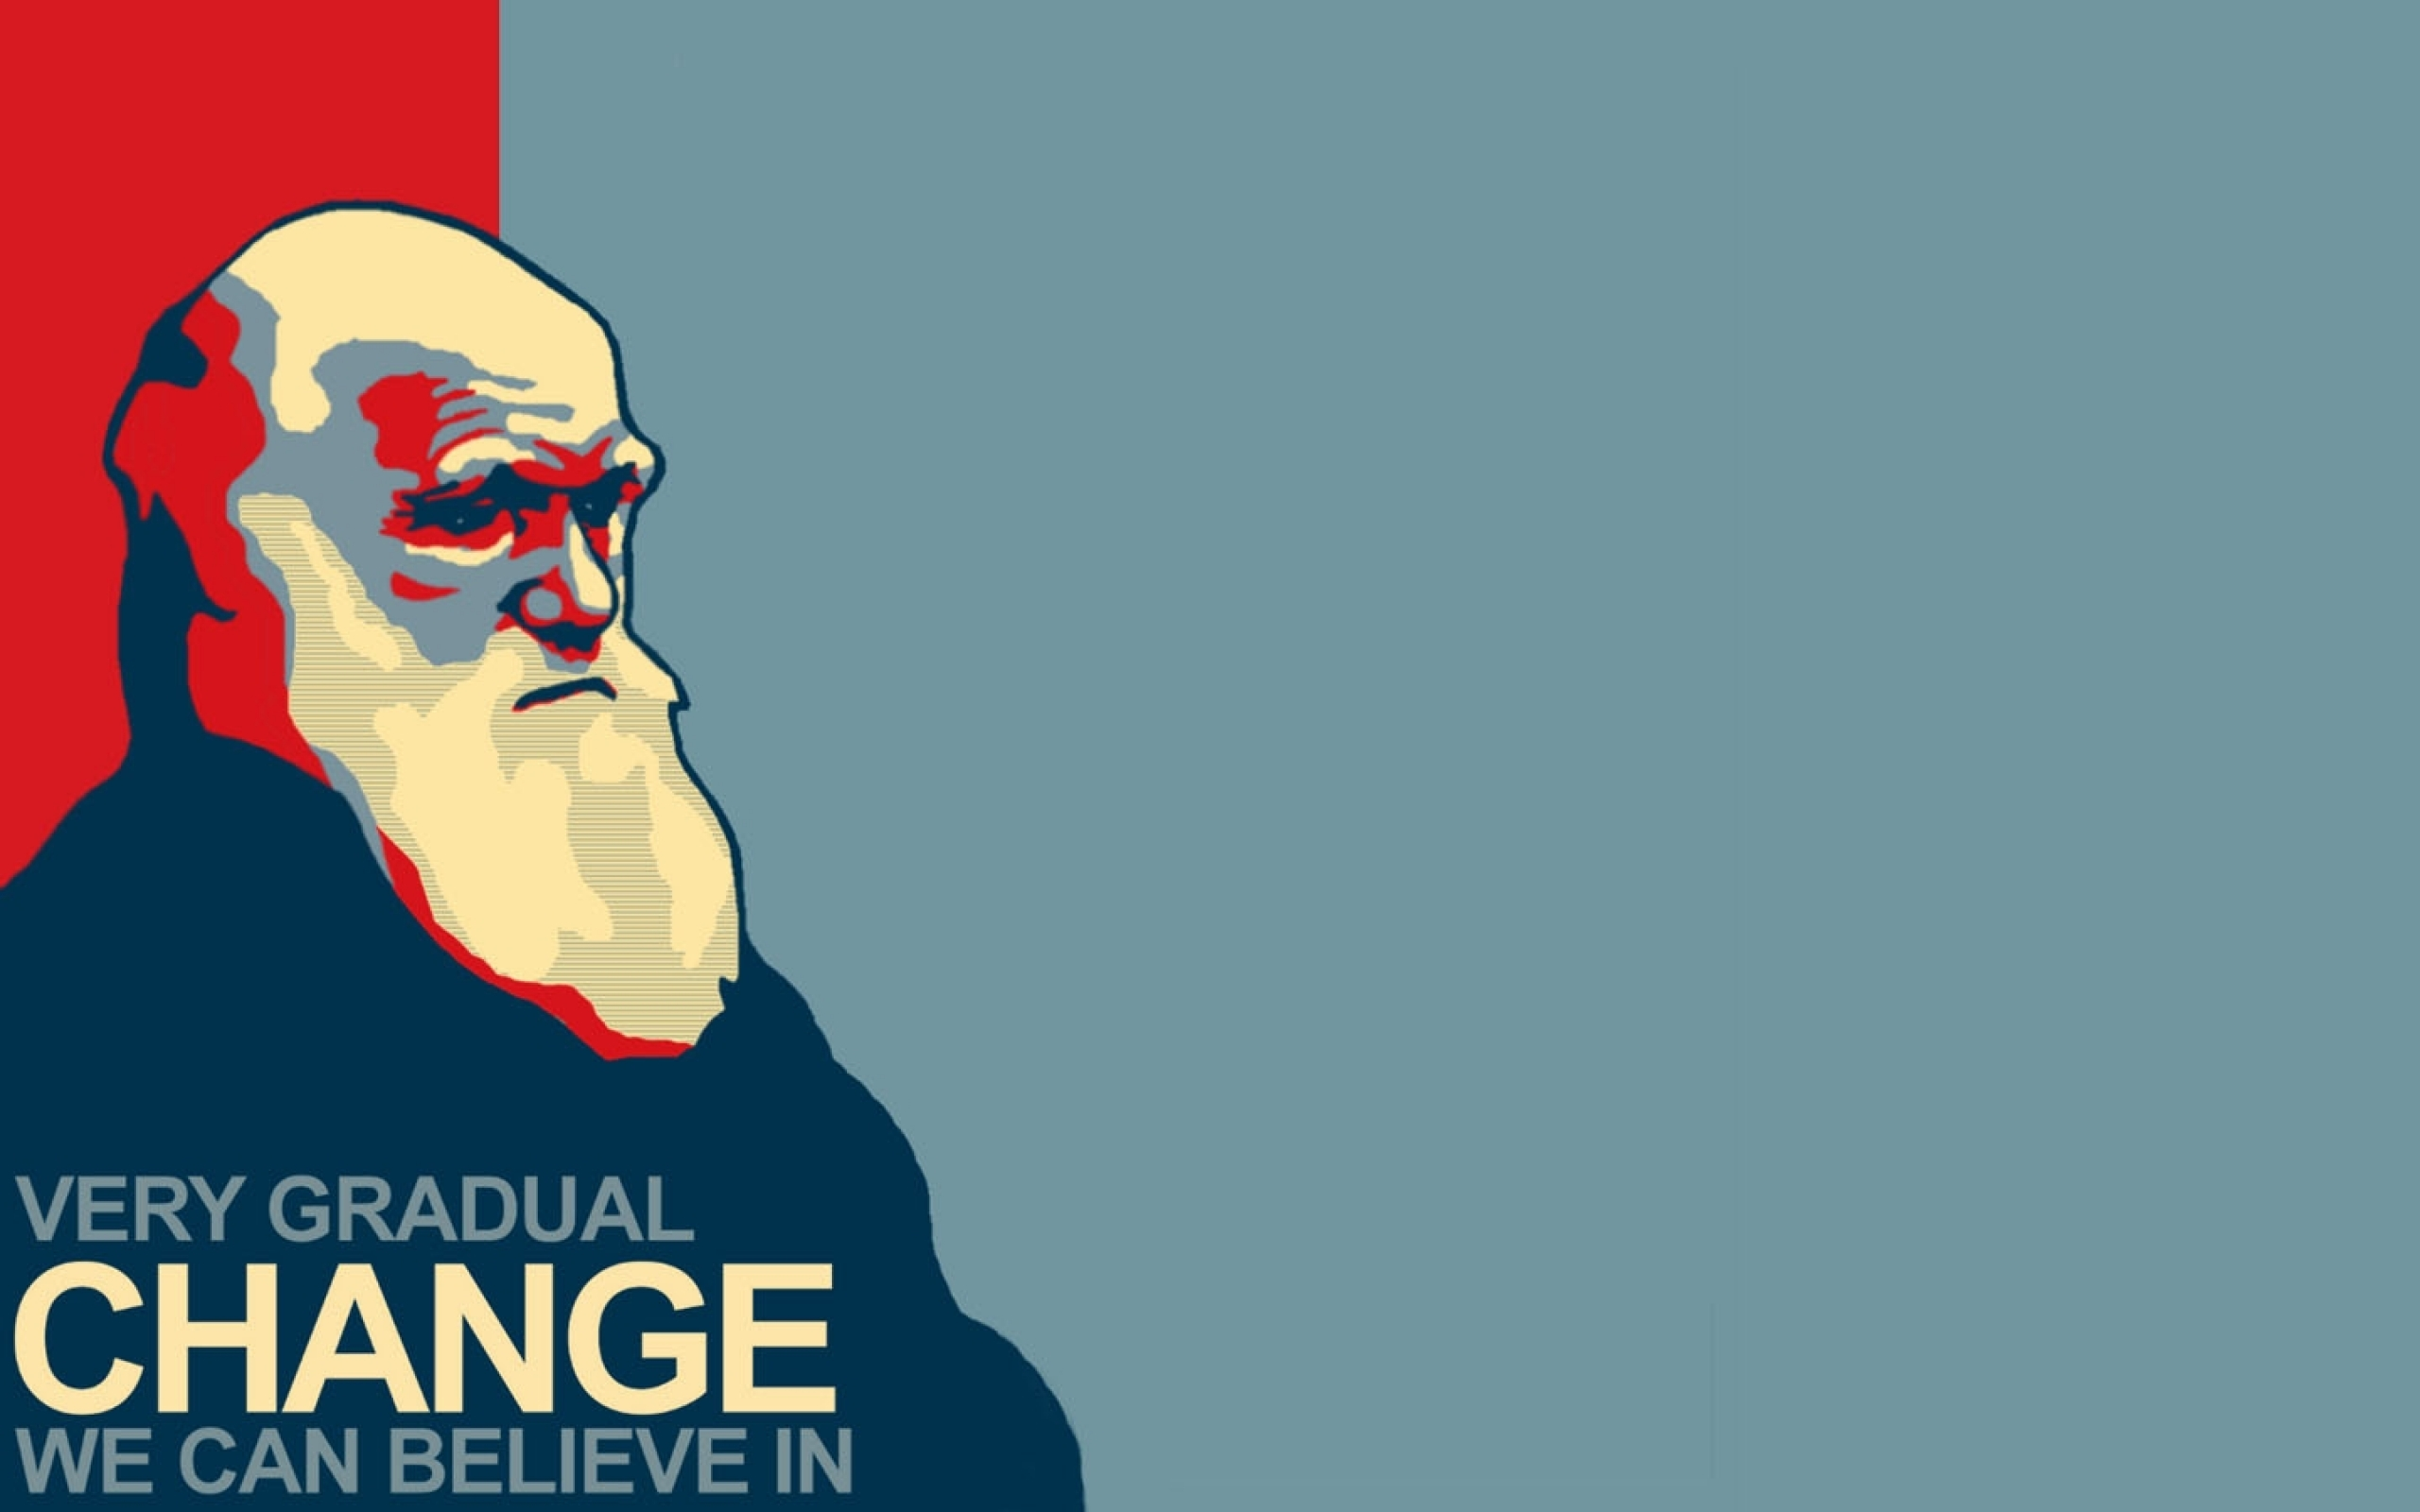 darwin - very gradual change 2